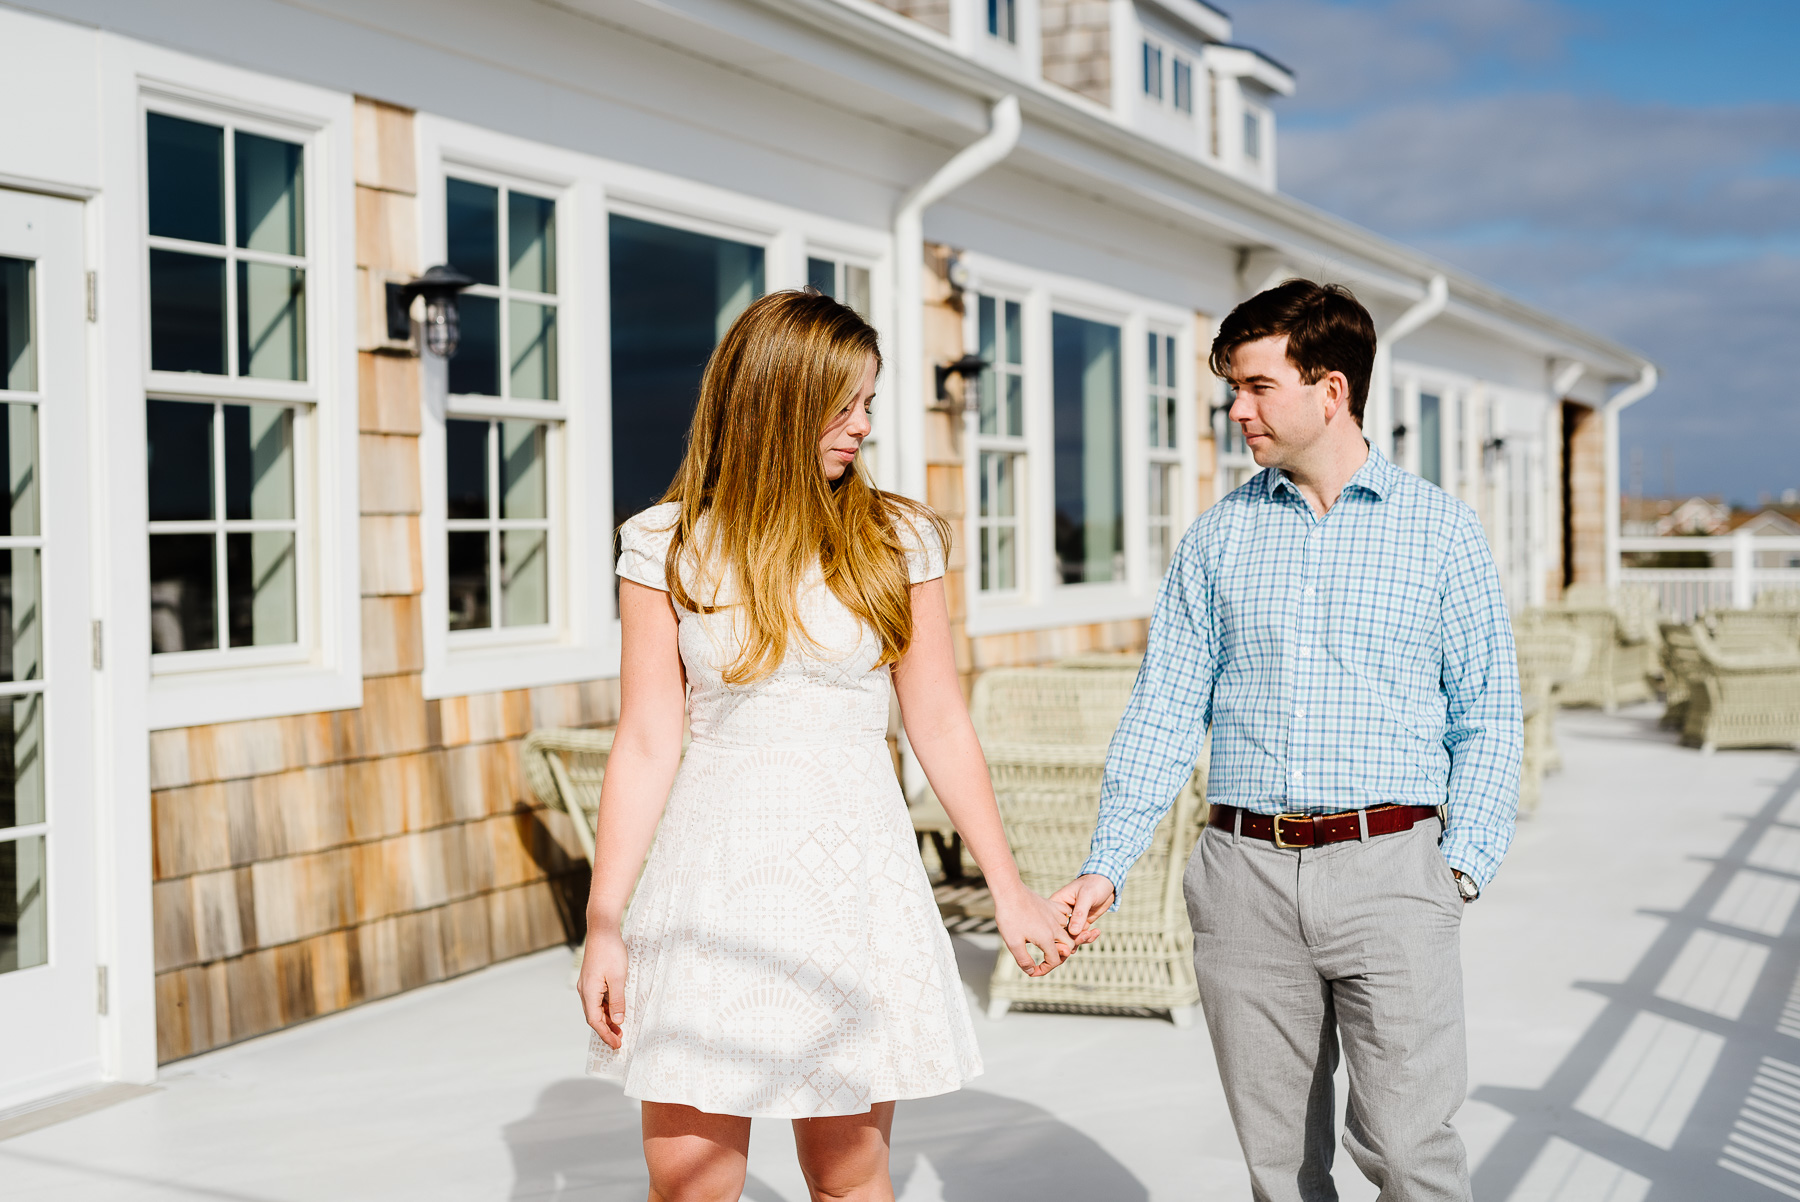 29-Bay Head NJ Engagement New Jersery Engagement Photographer NYC Engagements Brooklyn Engagement Photos Longbrook Photography.jpg